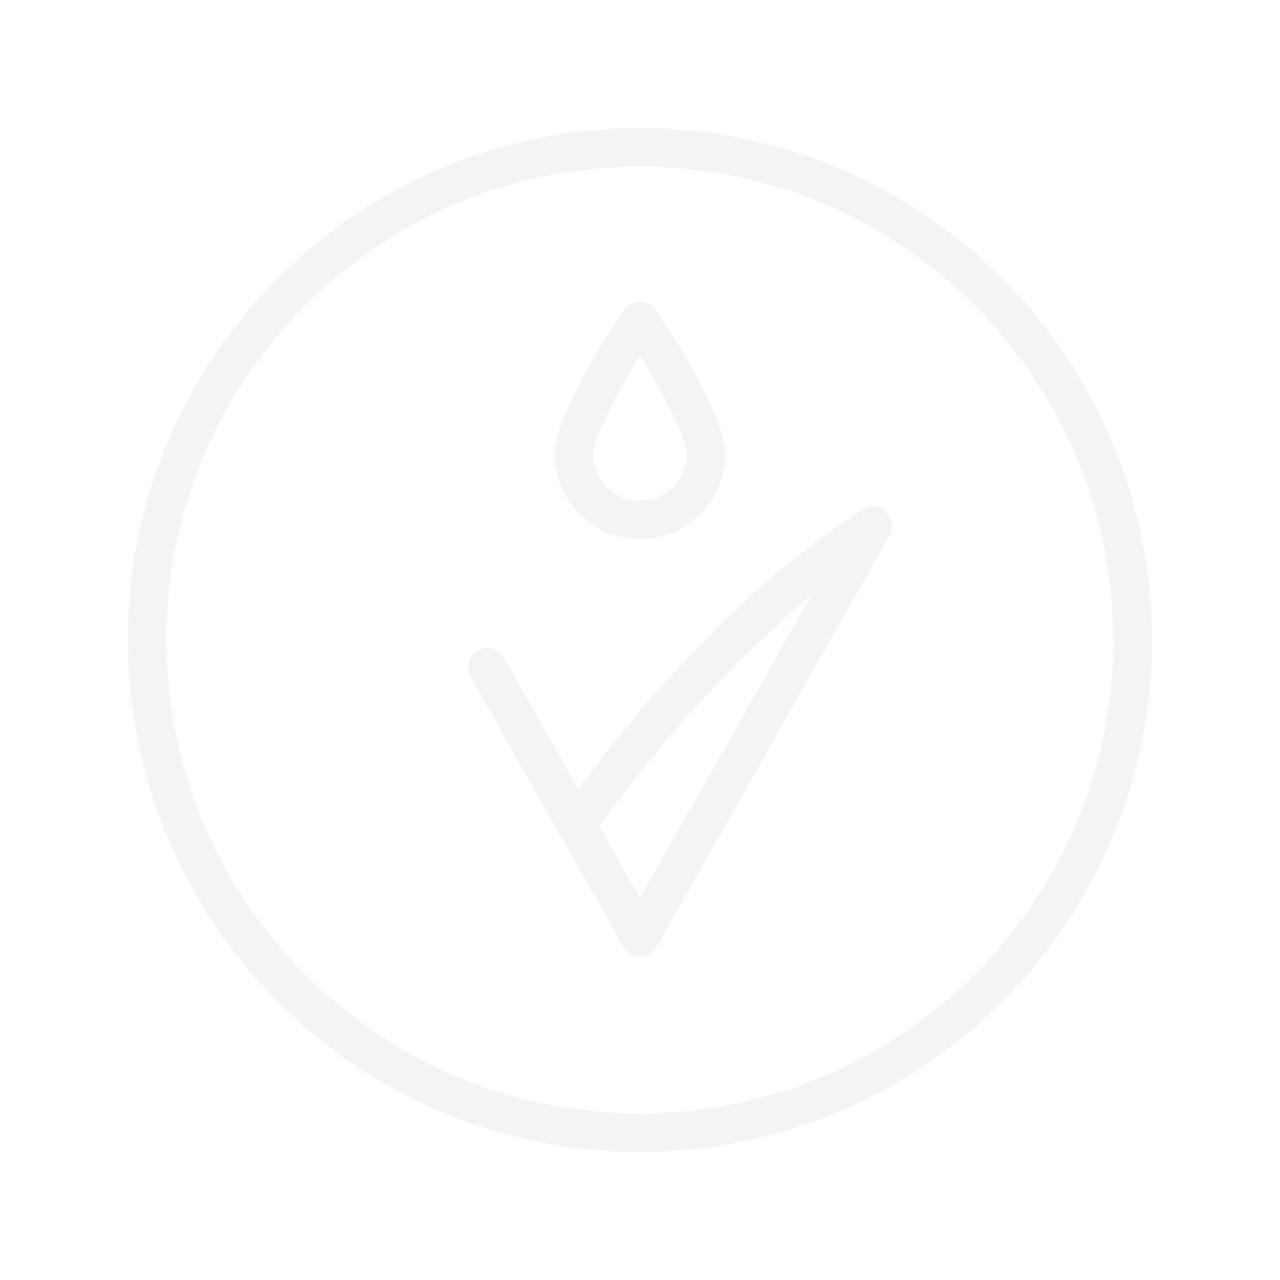 MAYBELLINE The Colossal Big Shot Daring Black Mascara 9.5ml